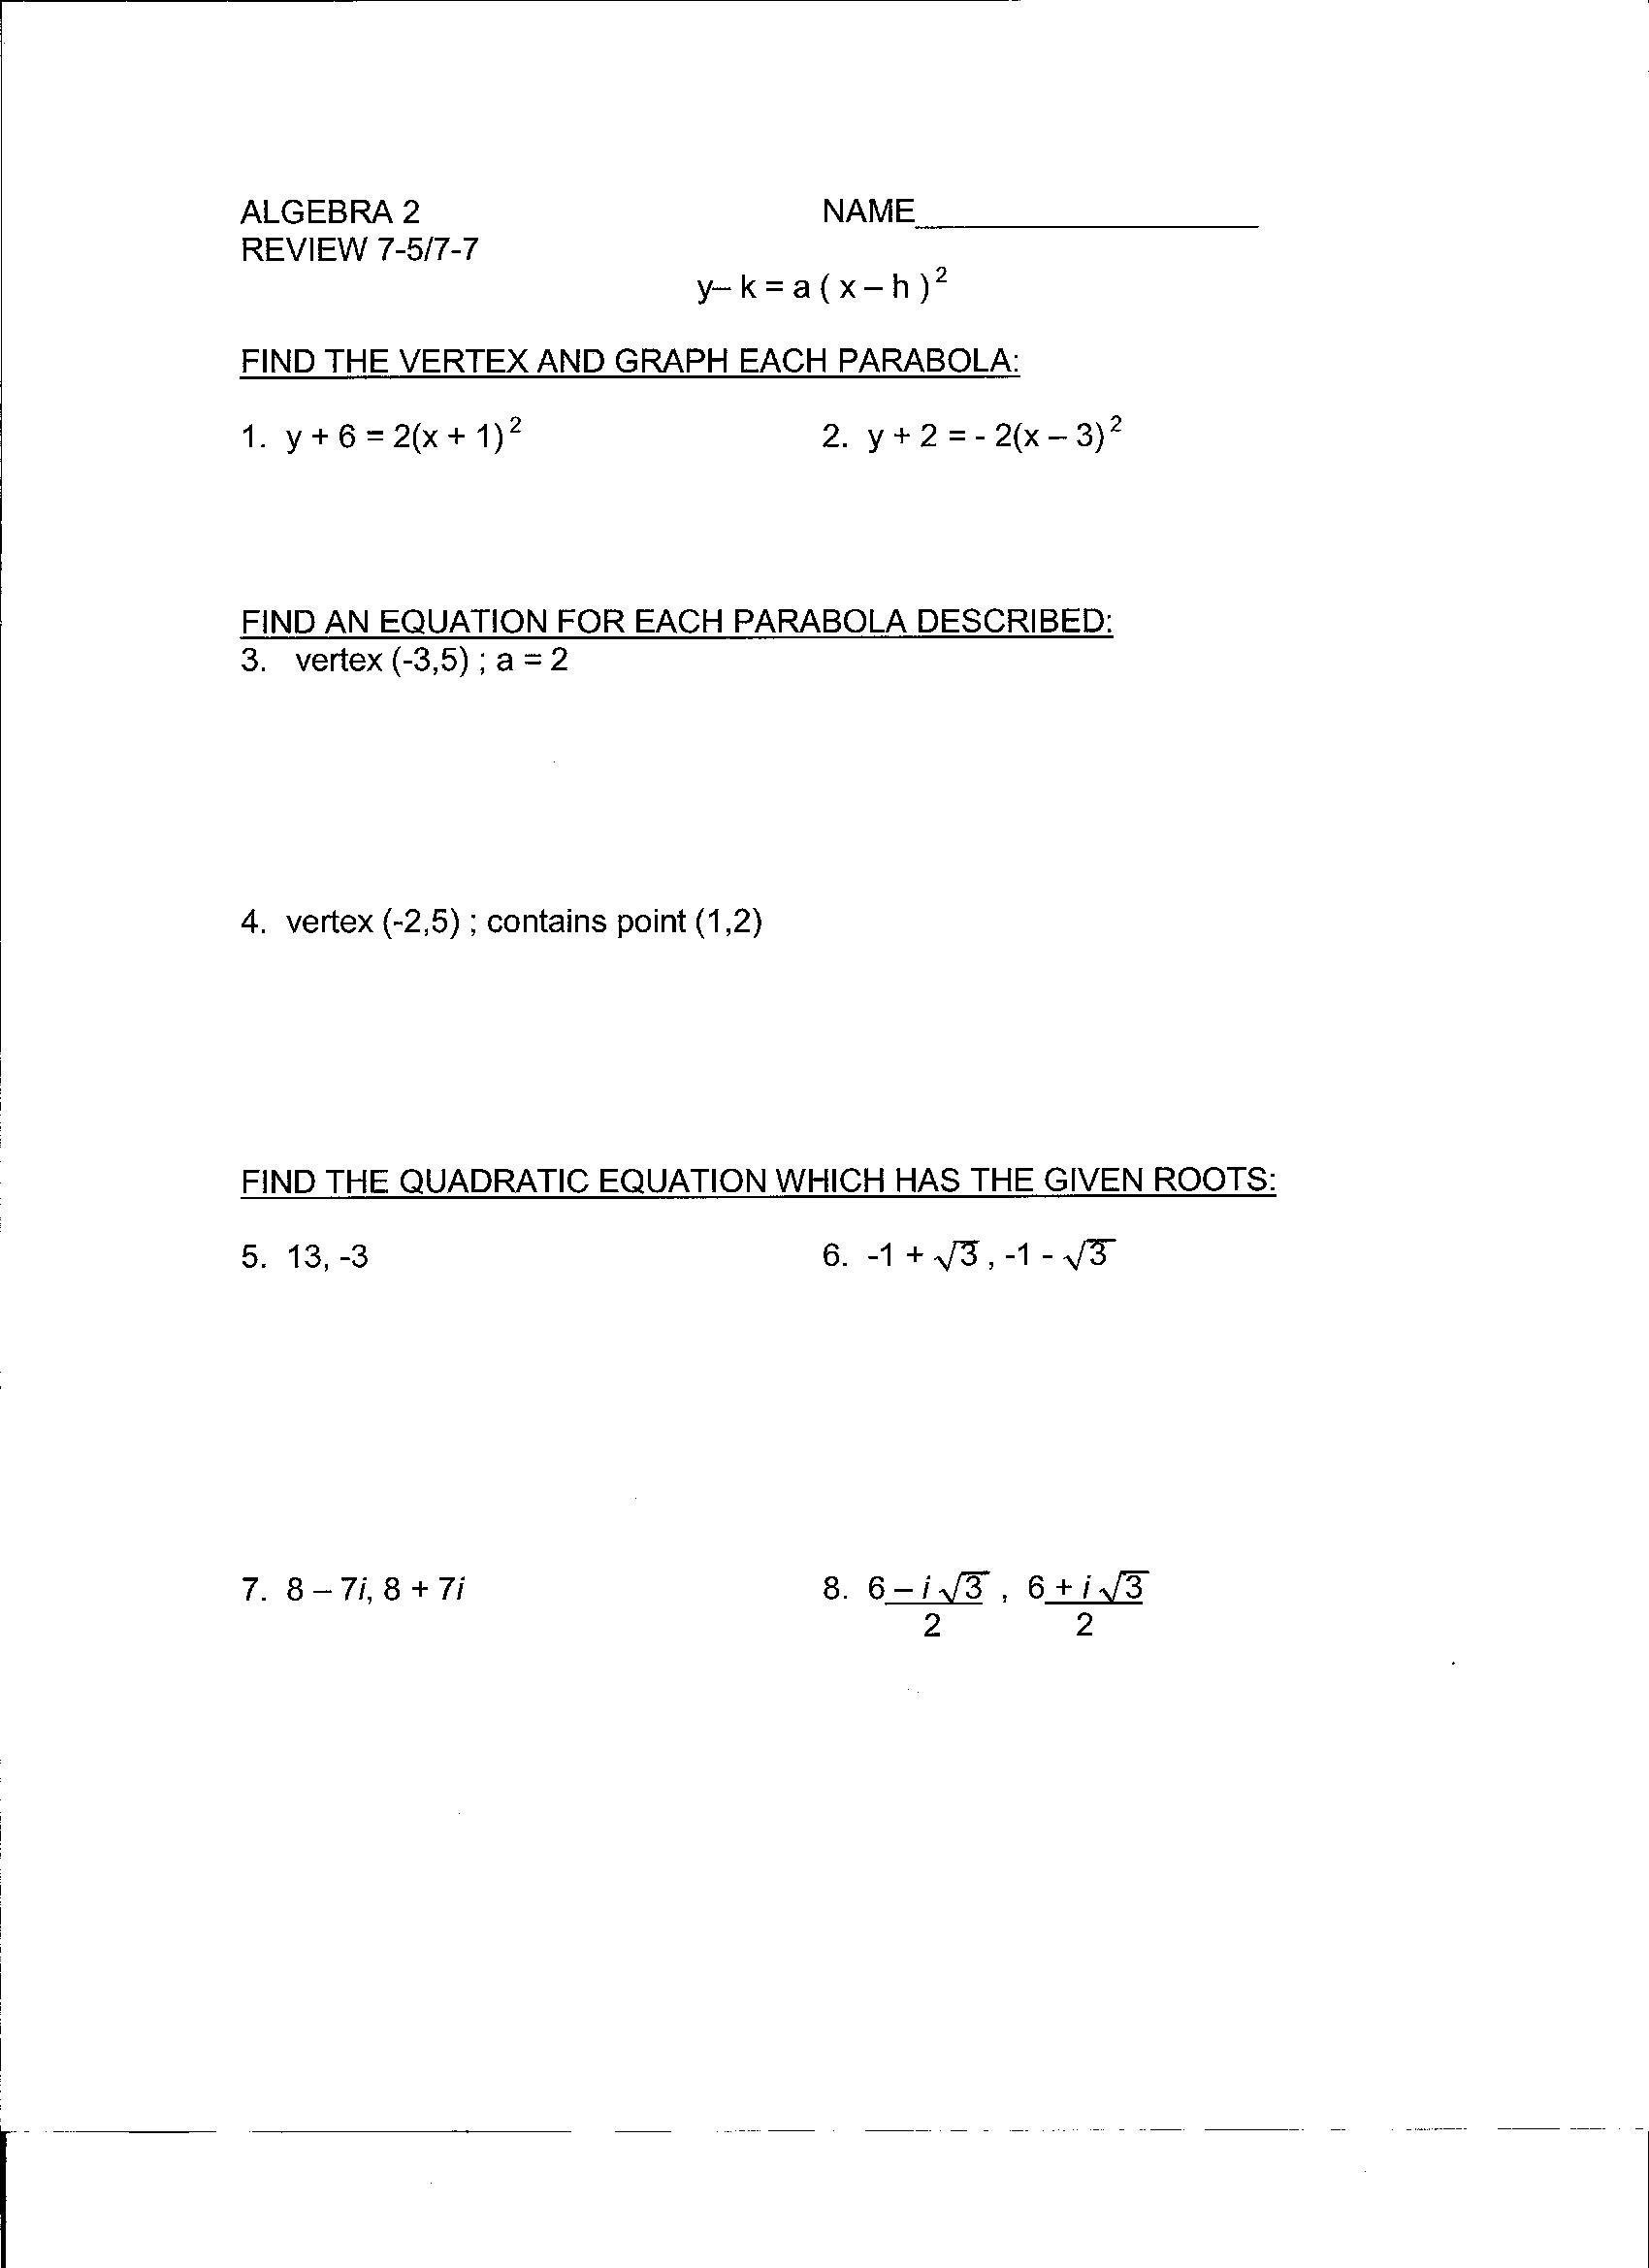 Beunier-Smith, Yvette / Algebra 2A Documents Chapters 5-10